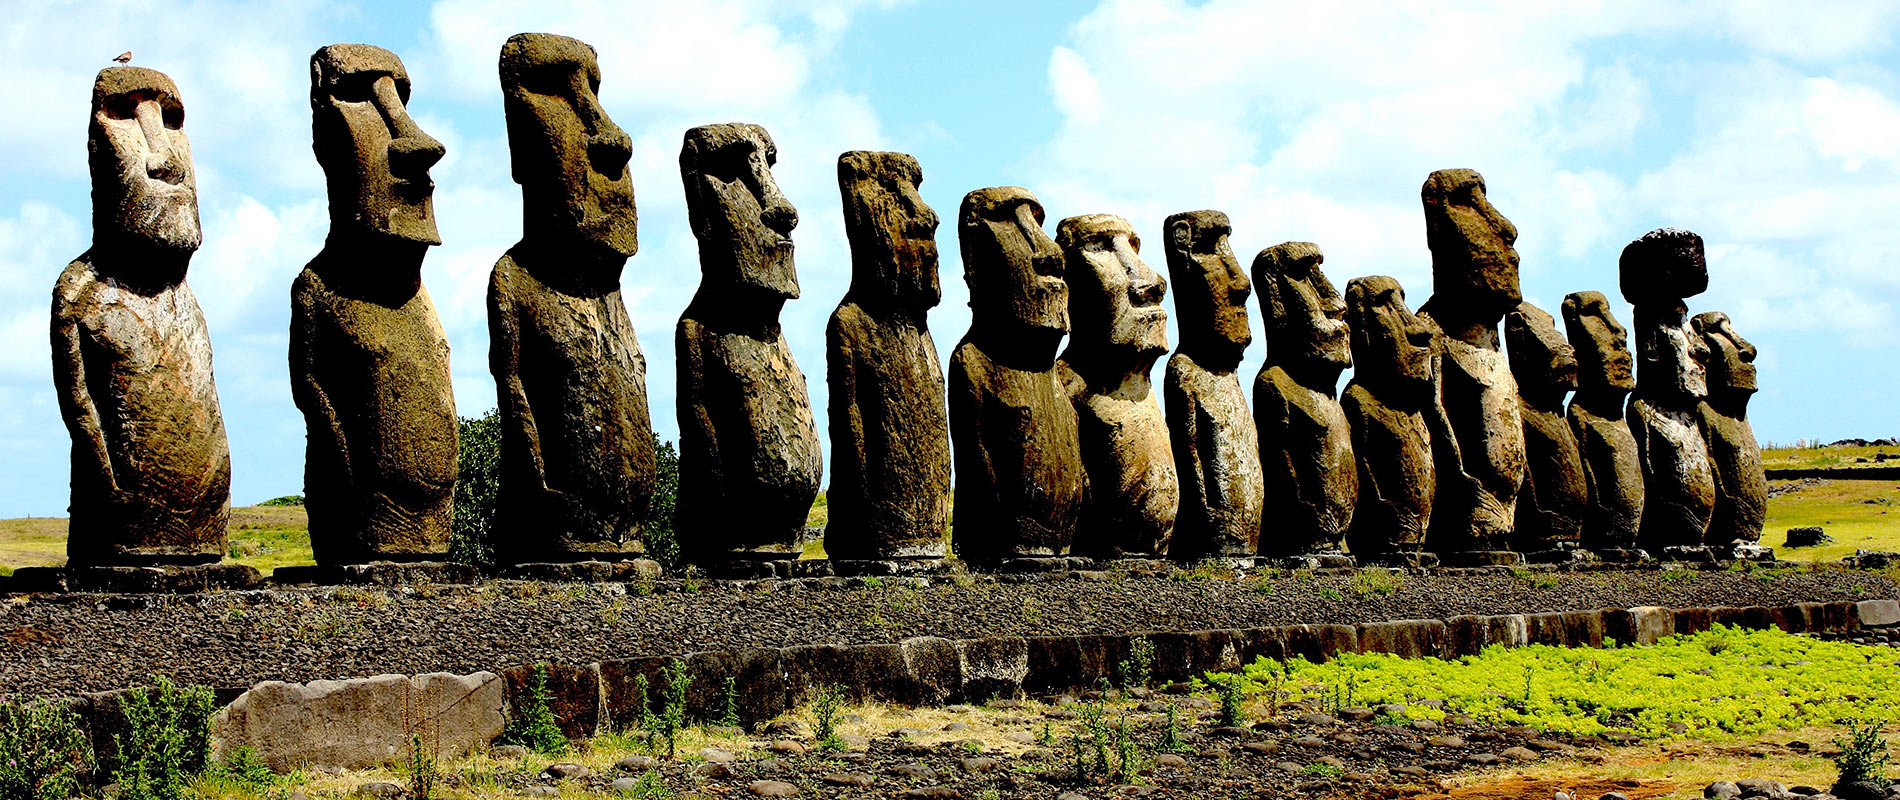 chili ile de paques voyage moaï statue Easter Island, Ahu Tongariki